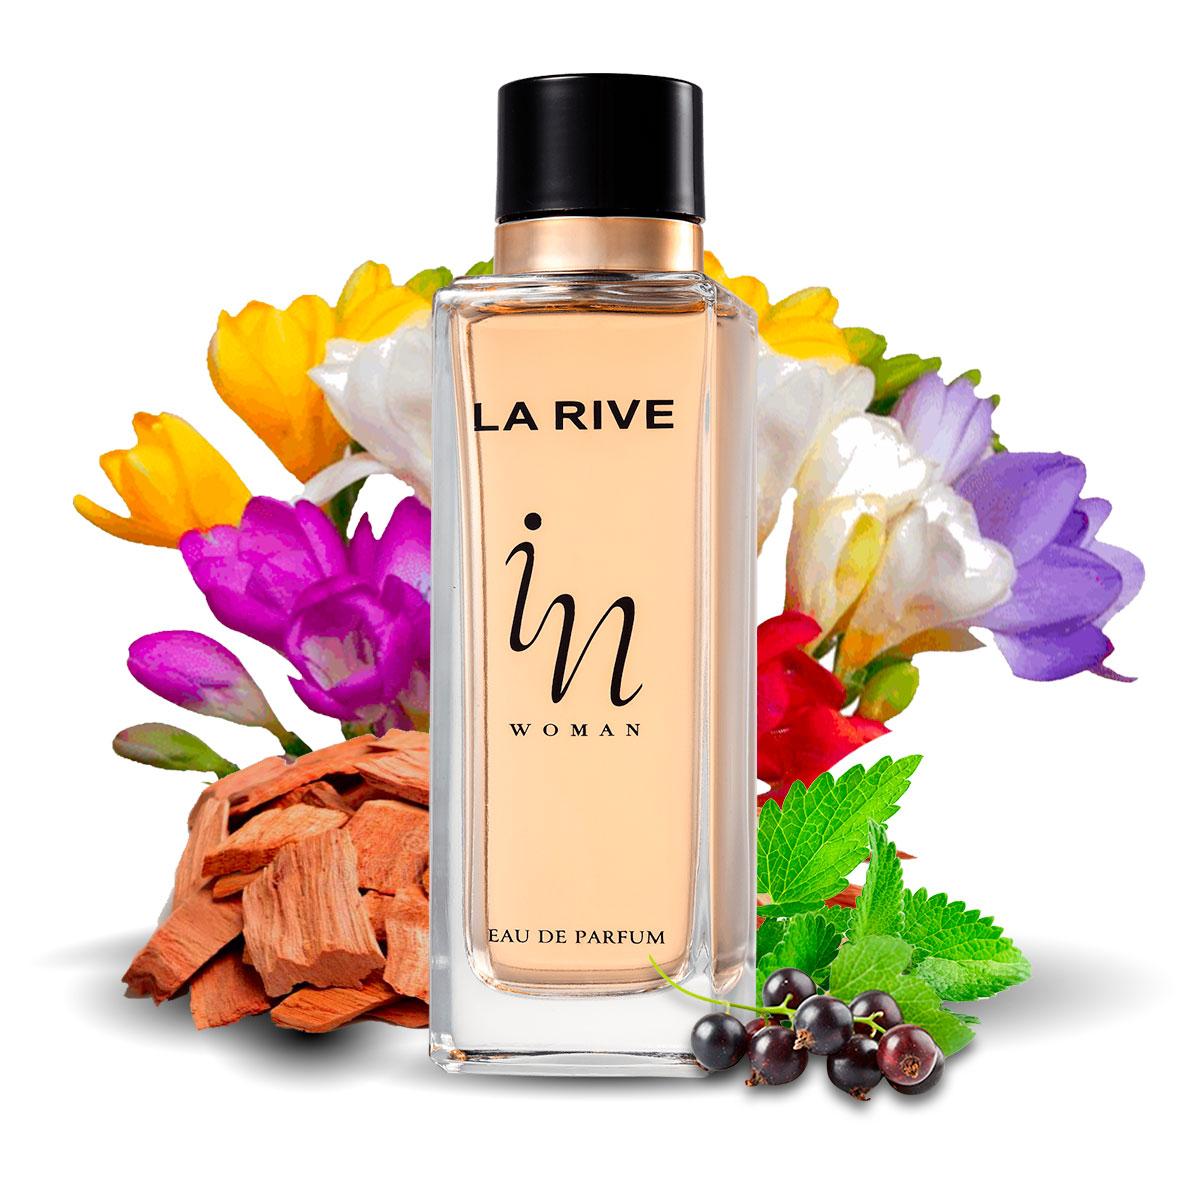 Kit 2 Perfumes Importados In Woman e Touch of Woman La Rive